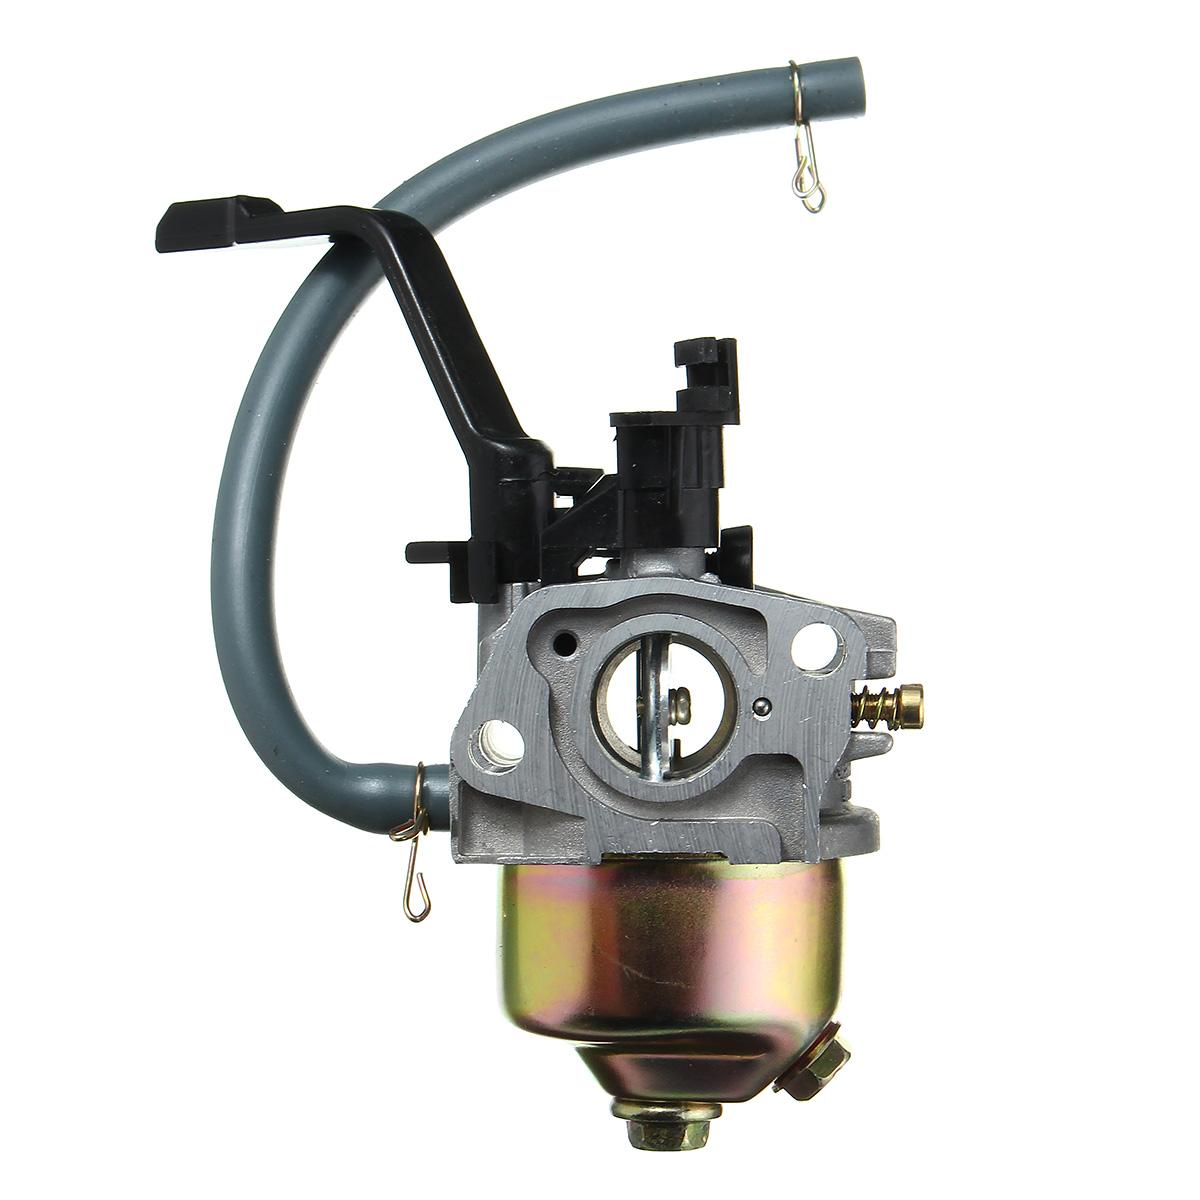 Dt466 Injector Wiring Diagram Free Download Wiring Diagram Schematic